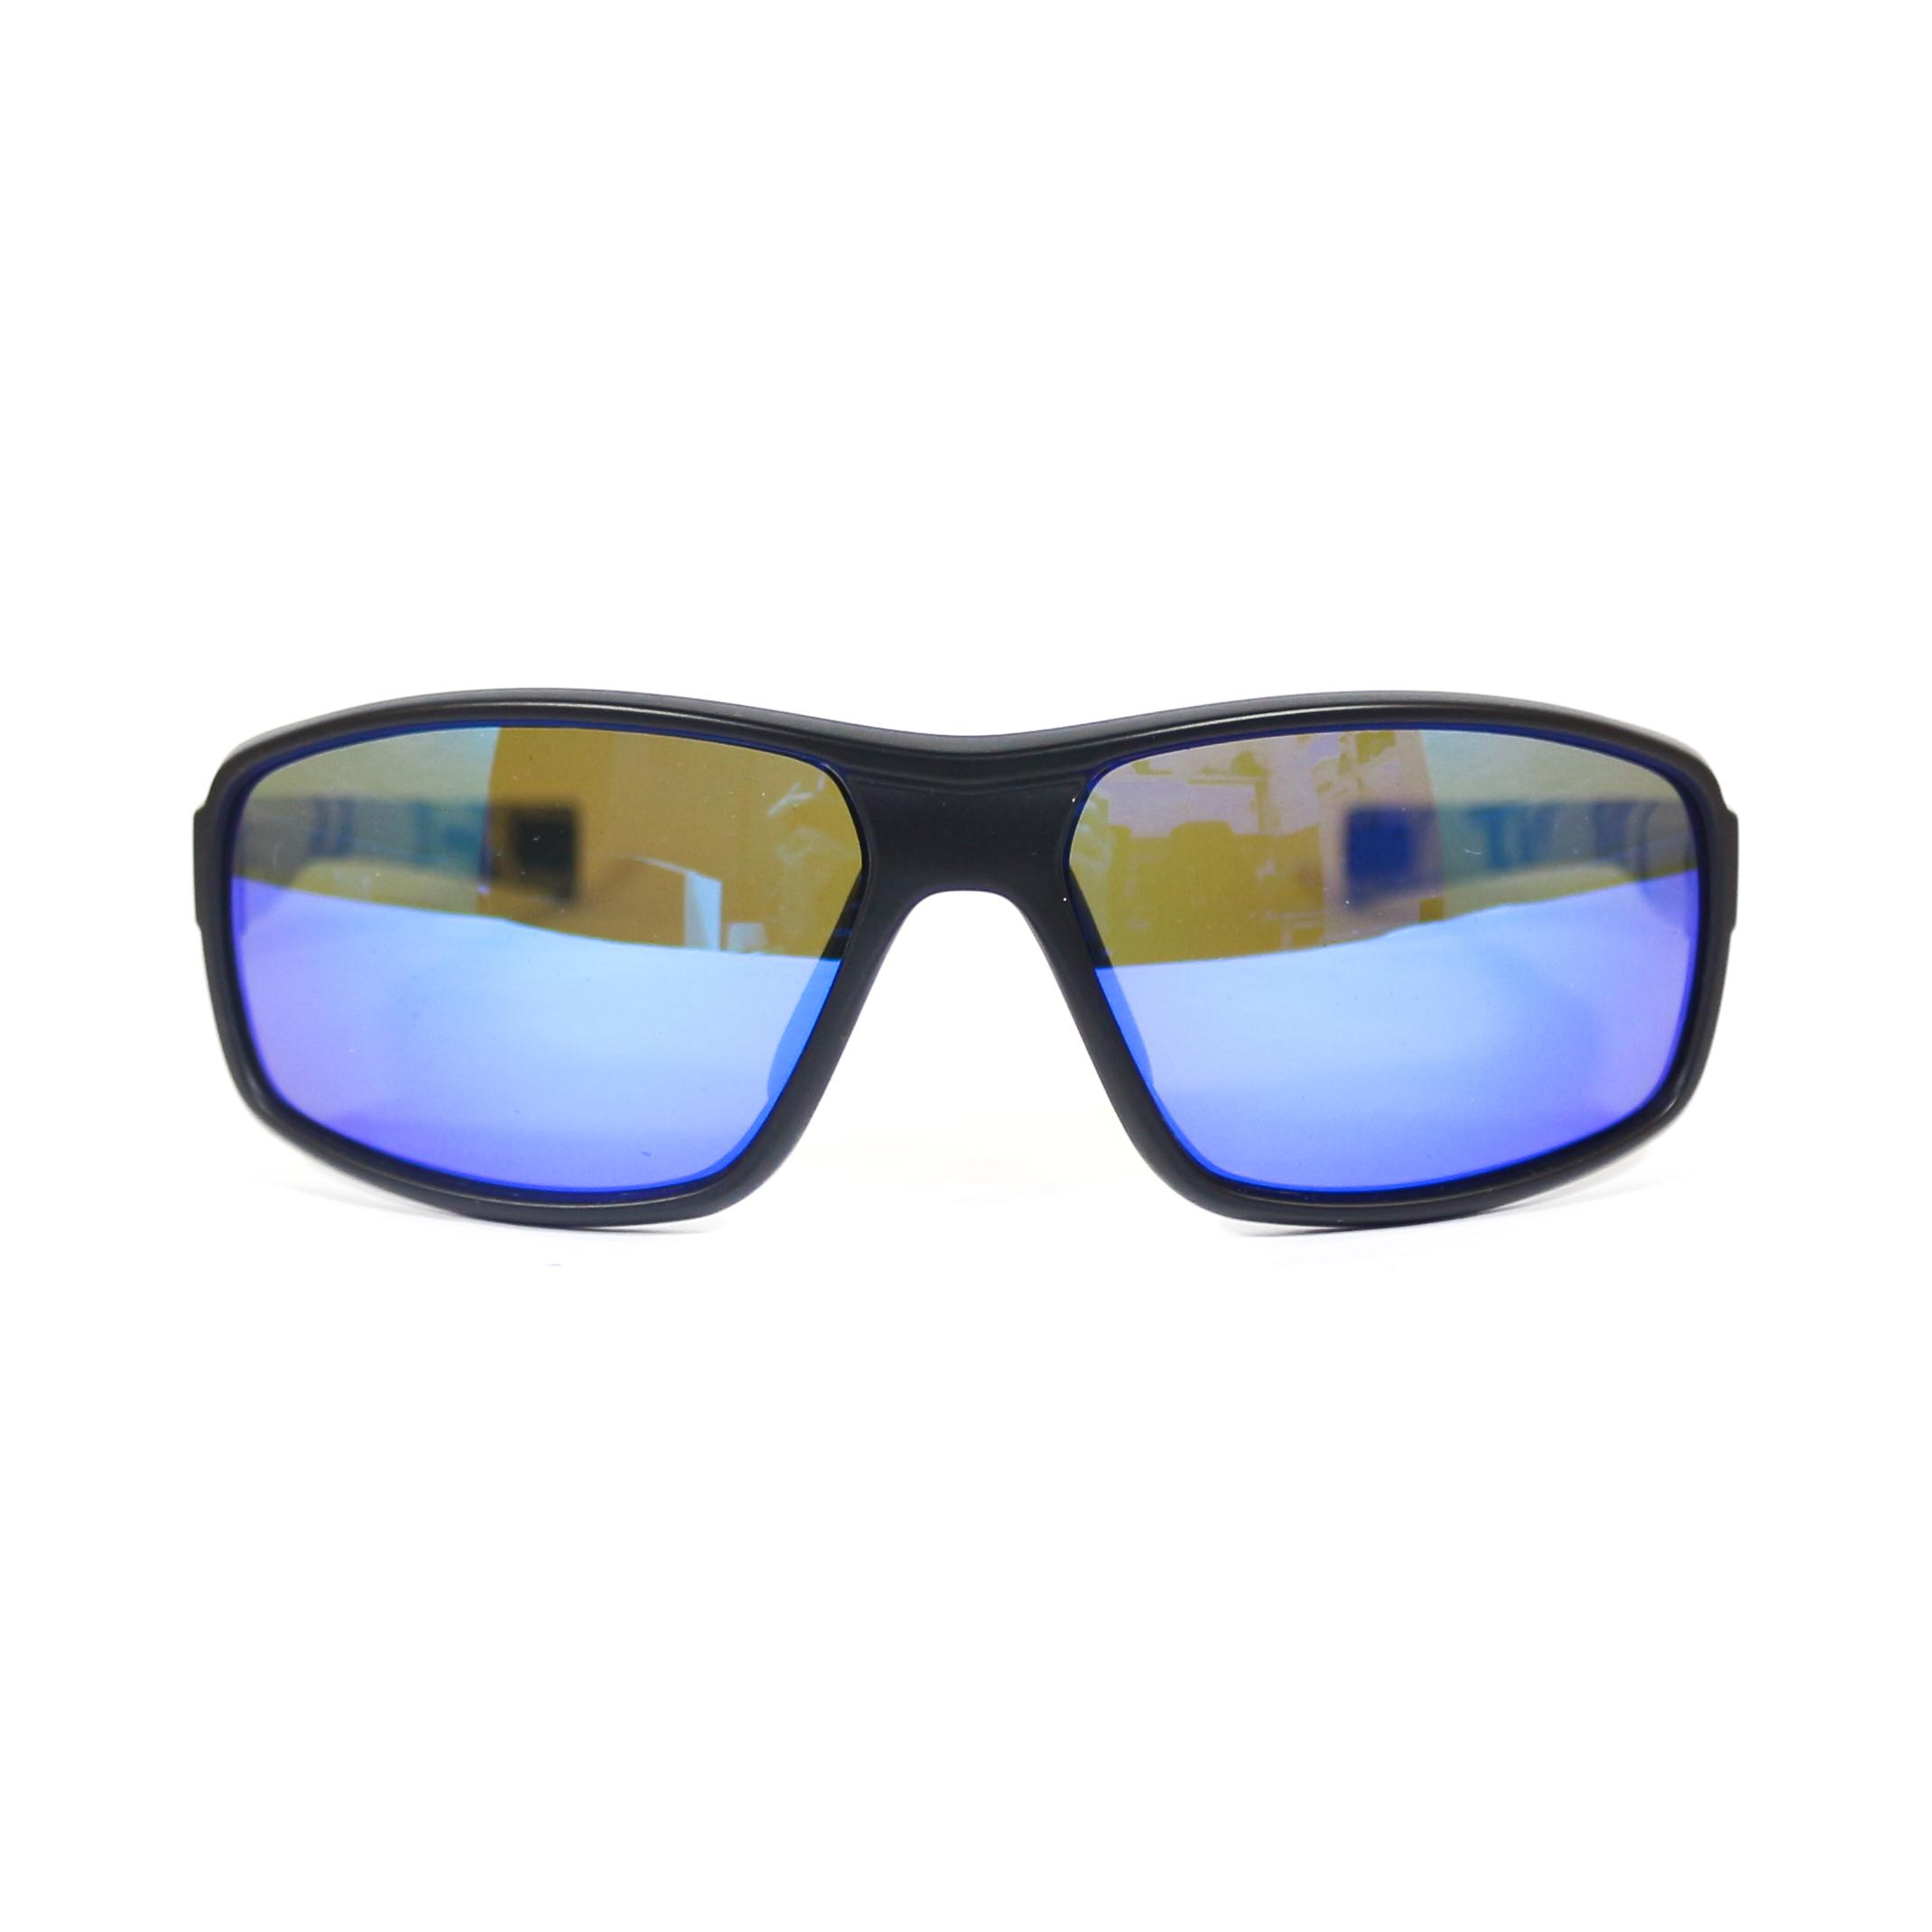 Zeal Polarised Fishing Sunglasses Bunny Walk BW-0200M Black / Gray Camo (1171)